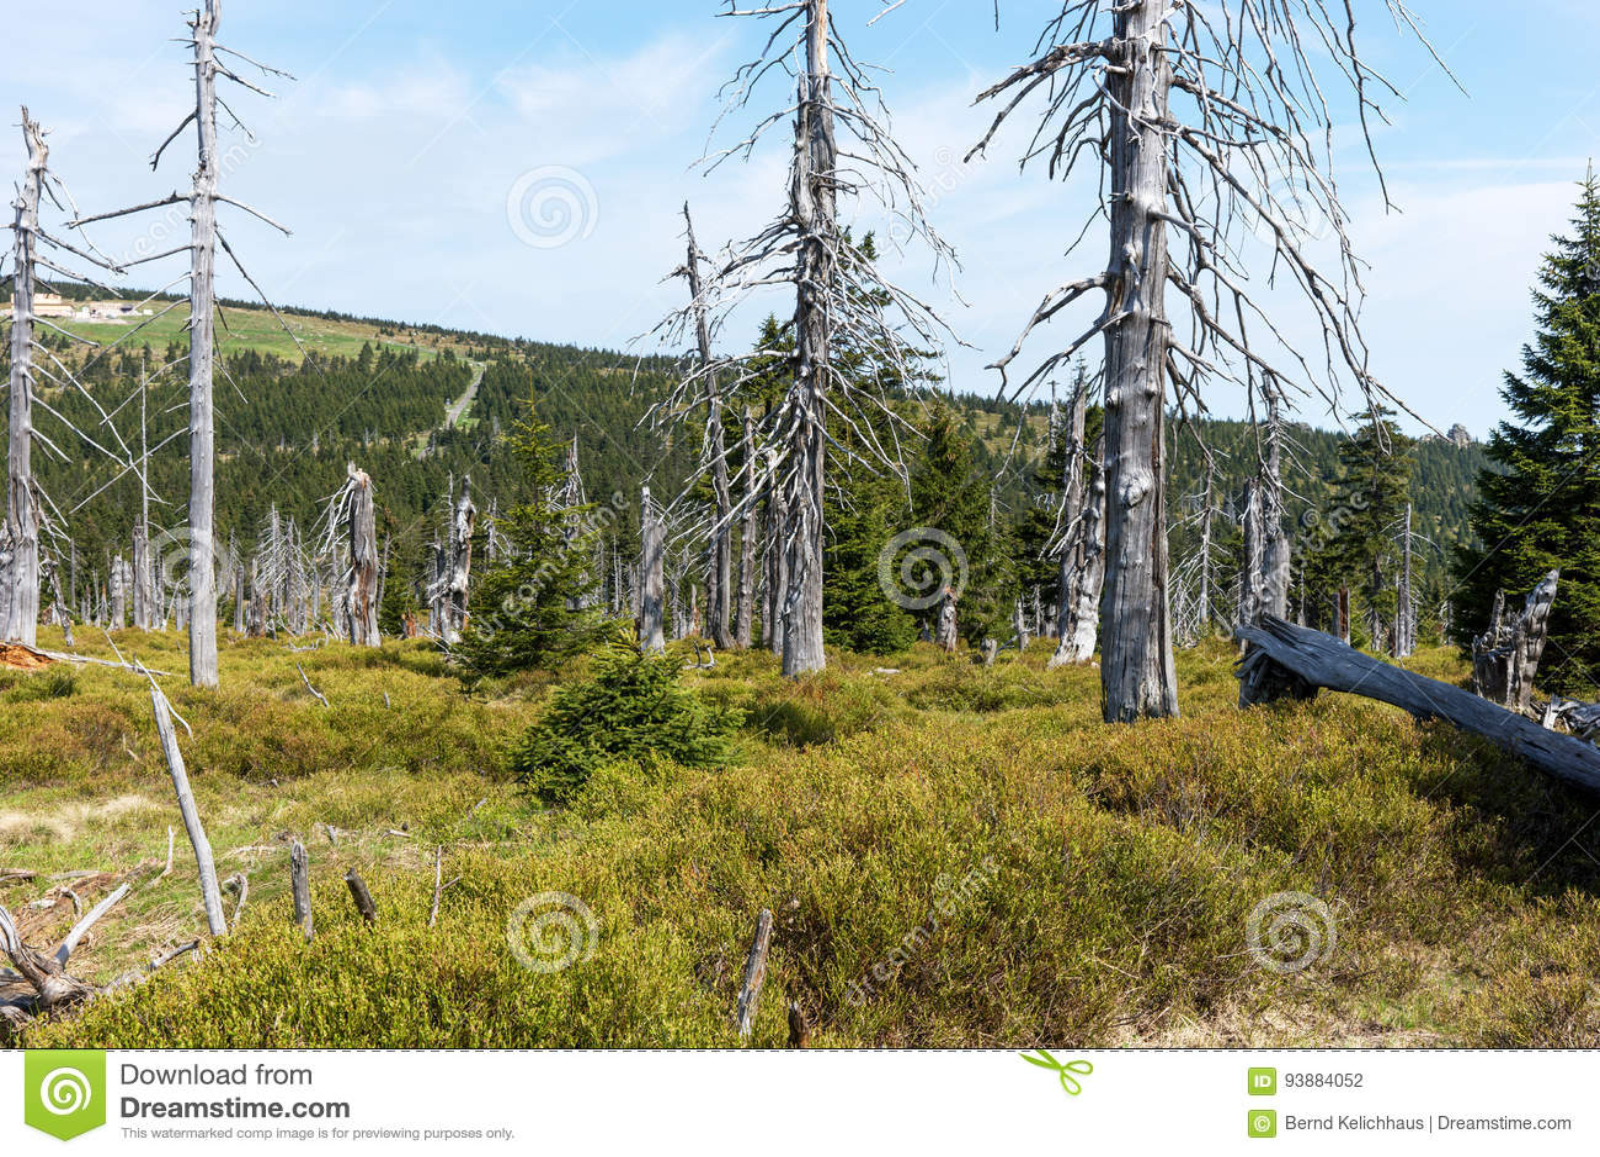 Dode bomen - Effect van milieuvervuiling